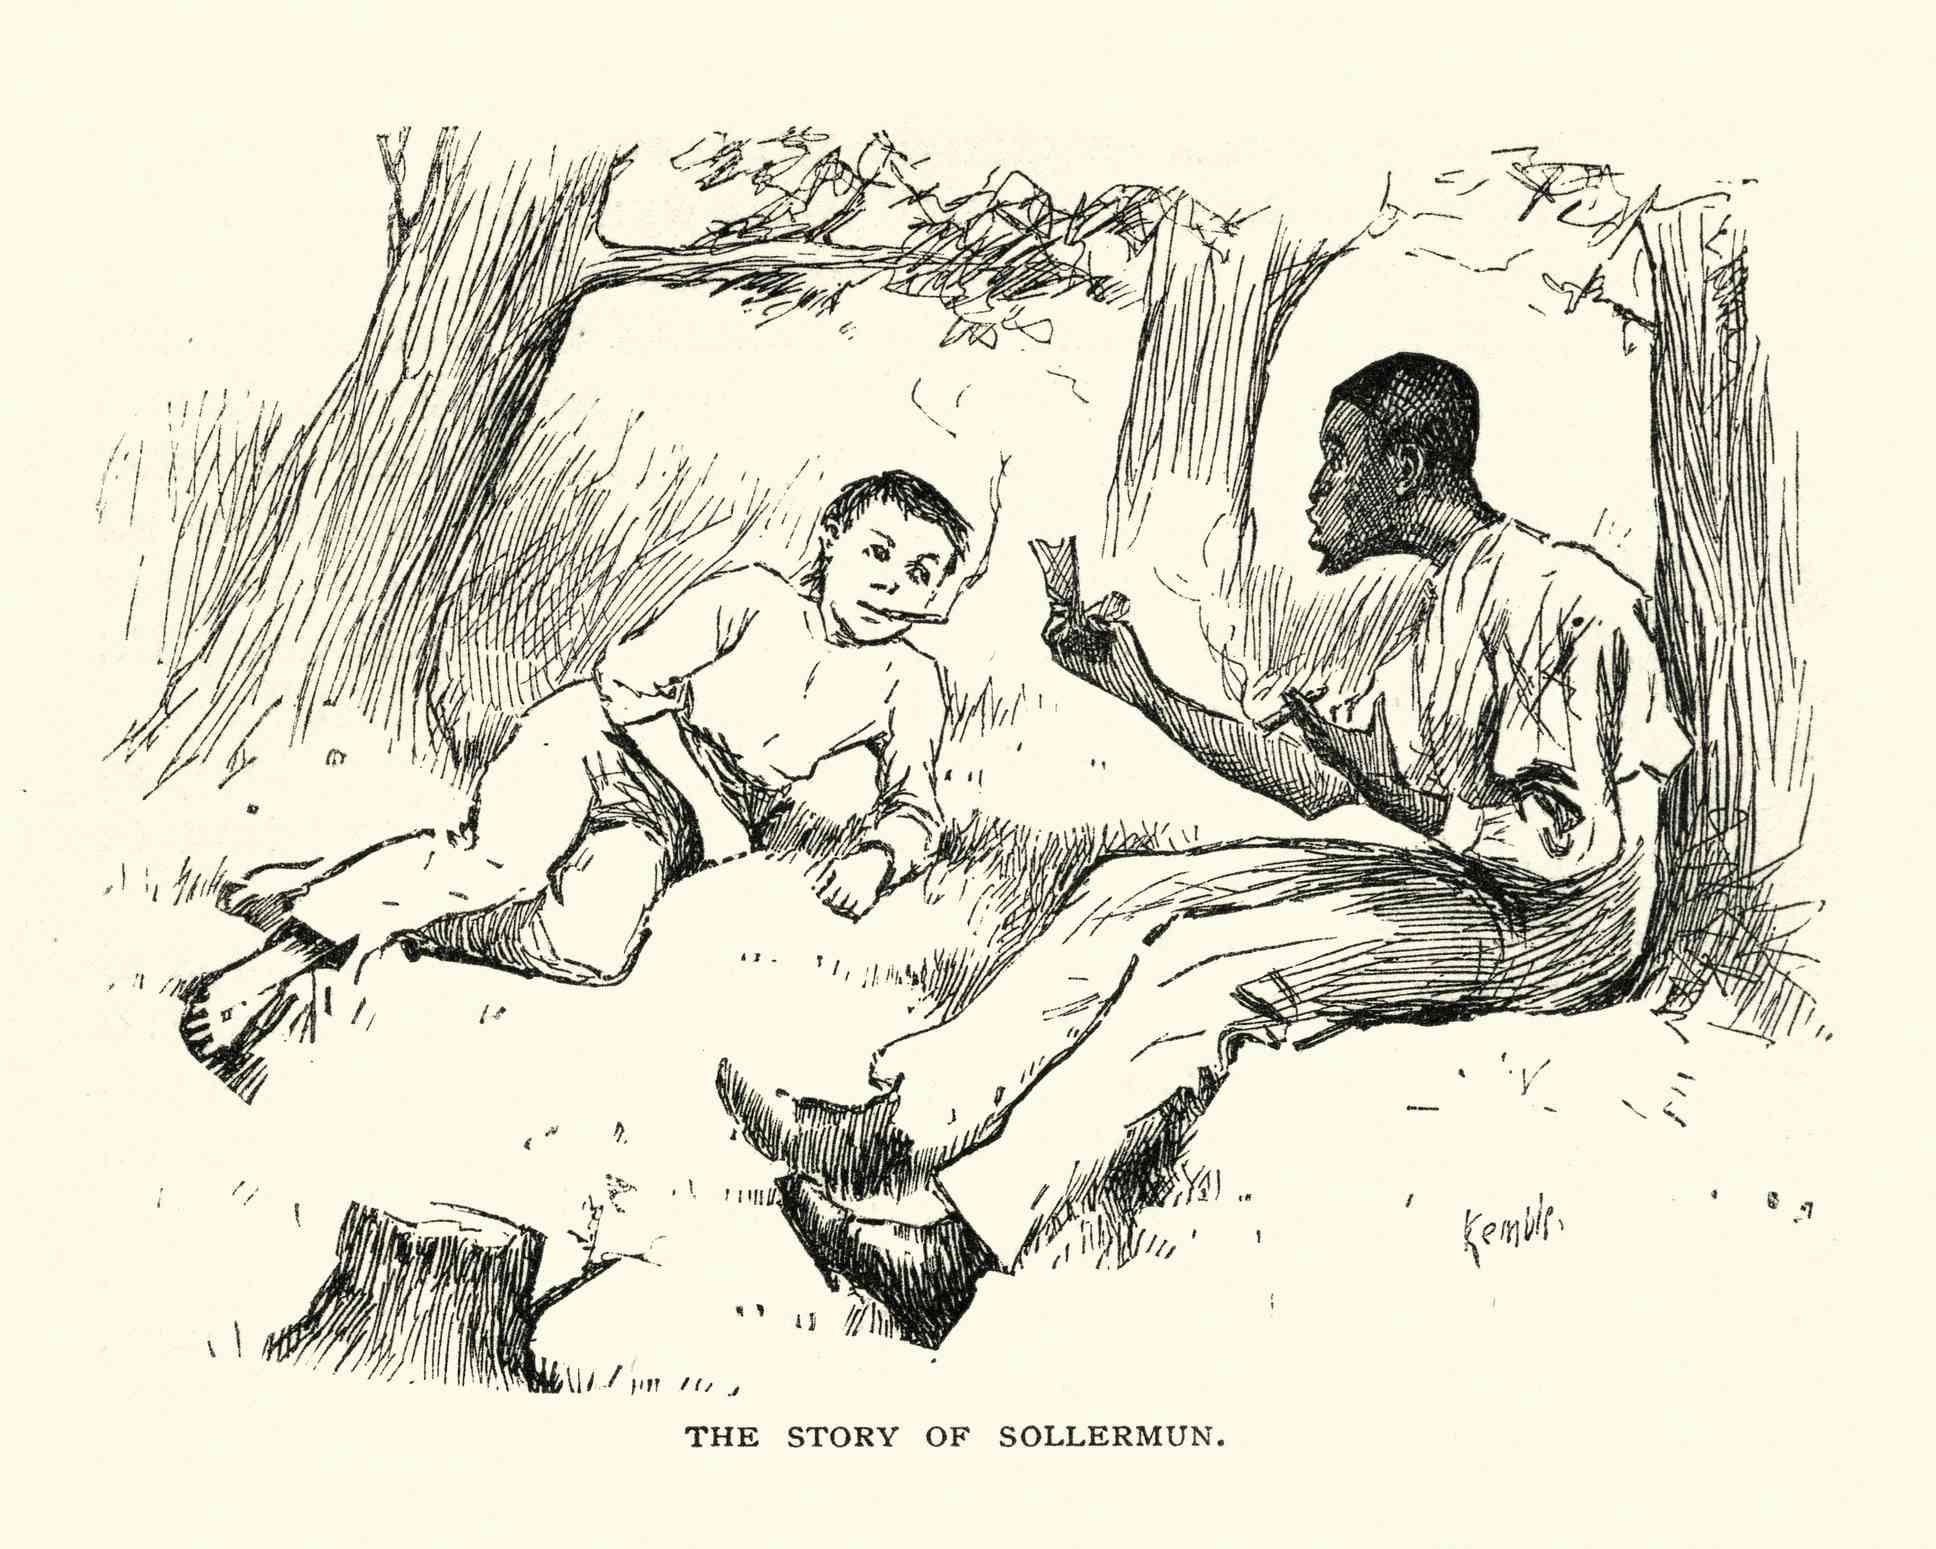 Adventures of Huckleberry Finn, Jim telling the story of Sollermun.